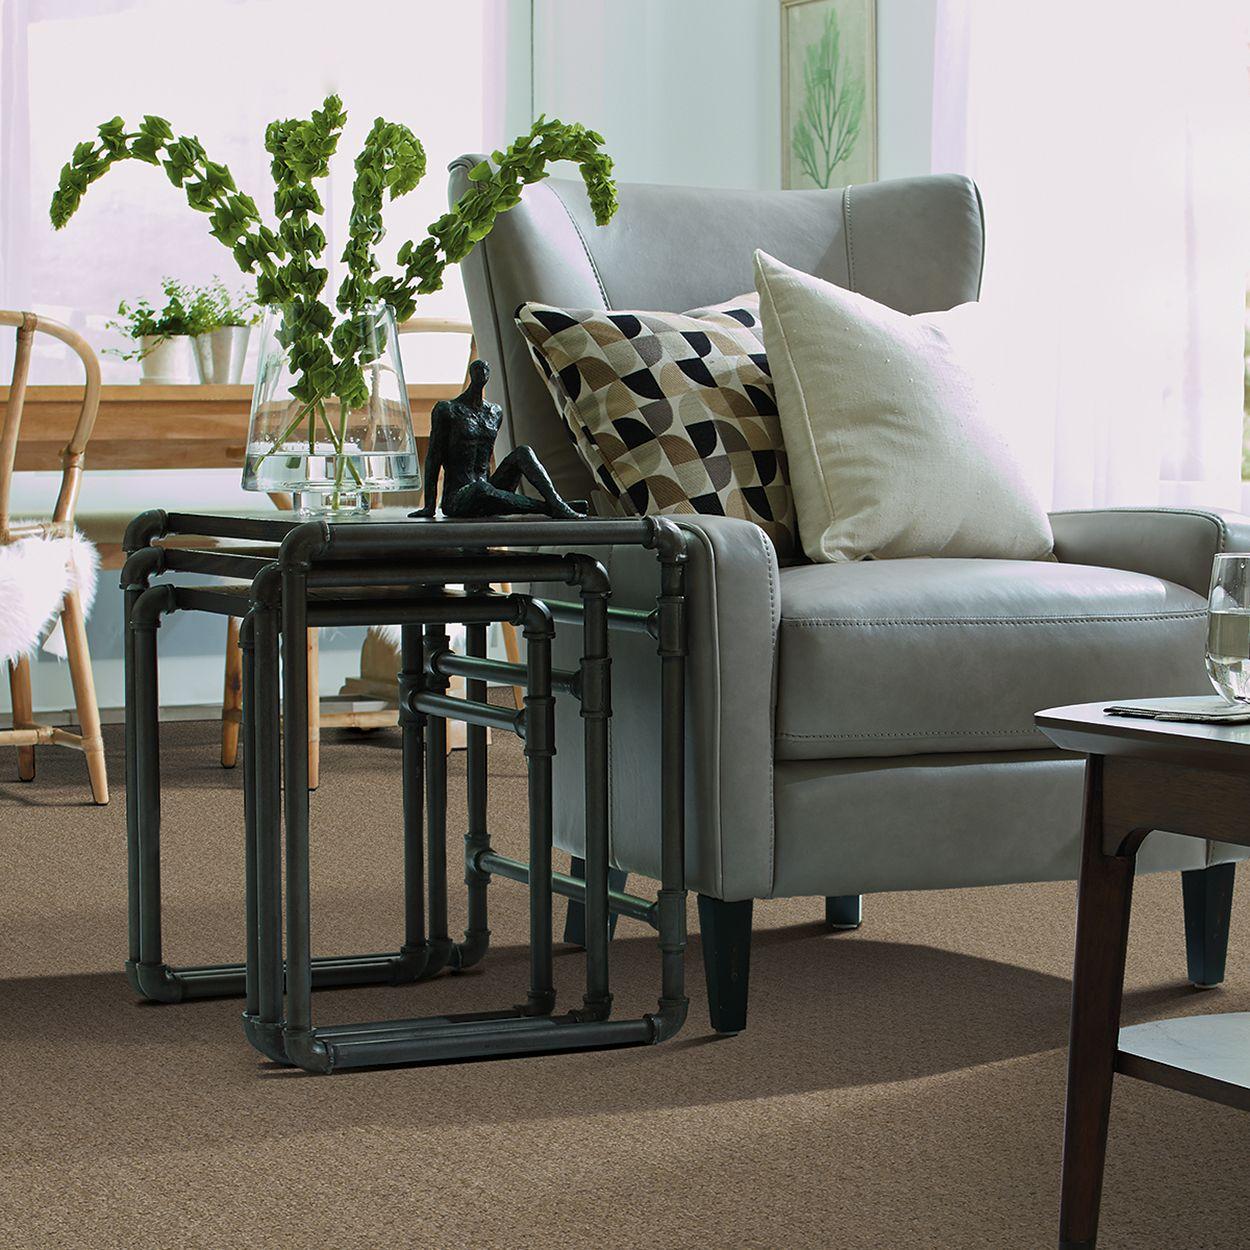 Tigressa Carpet in the style Laguna Flooring store